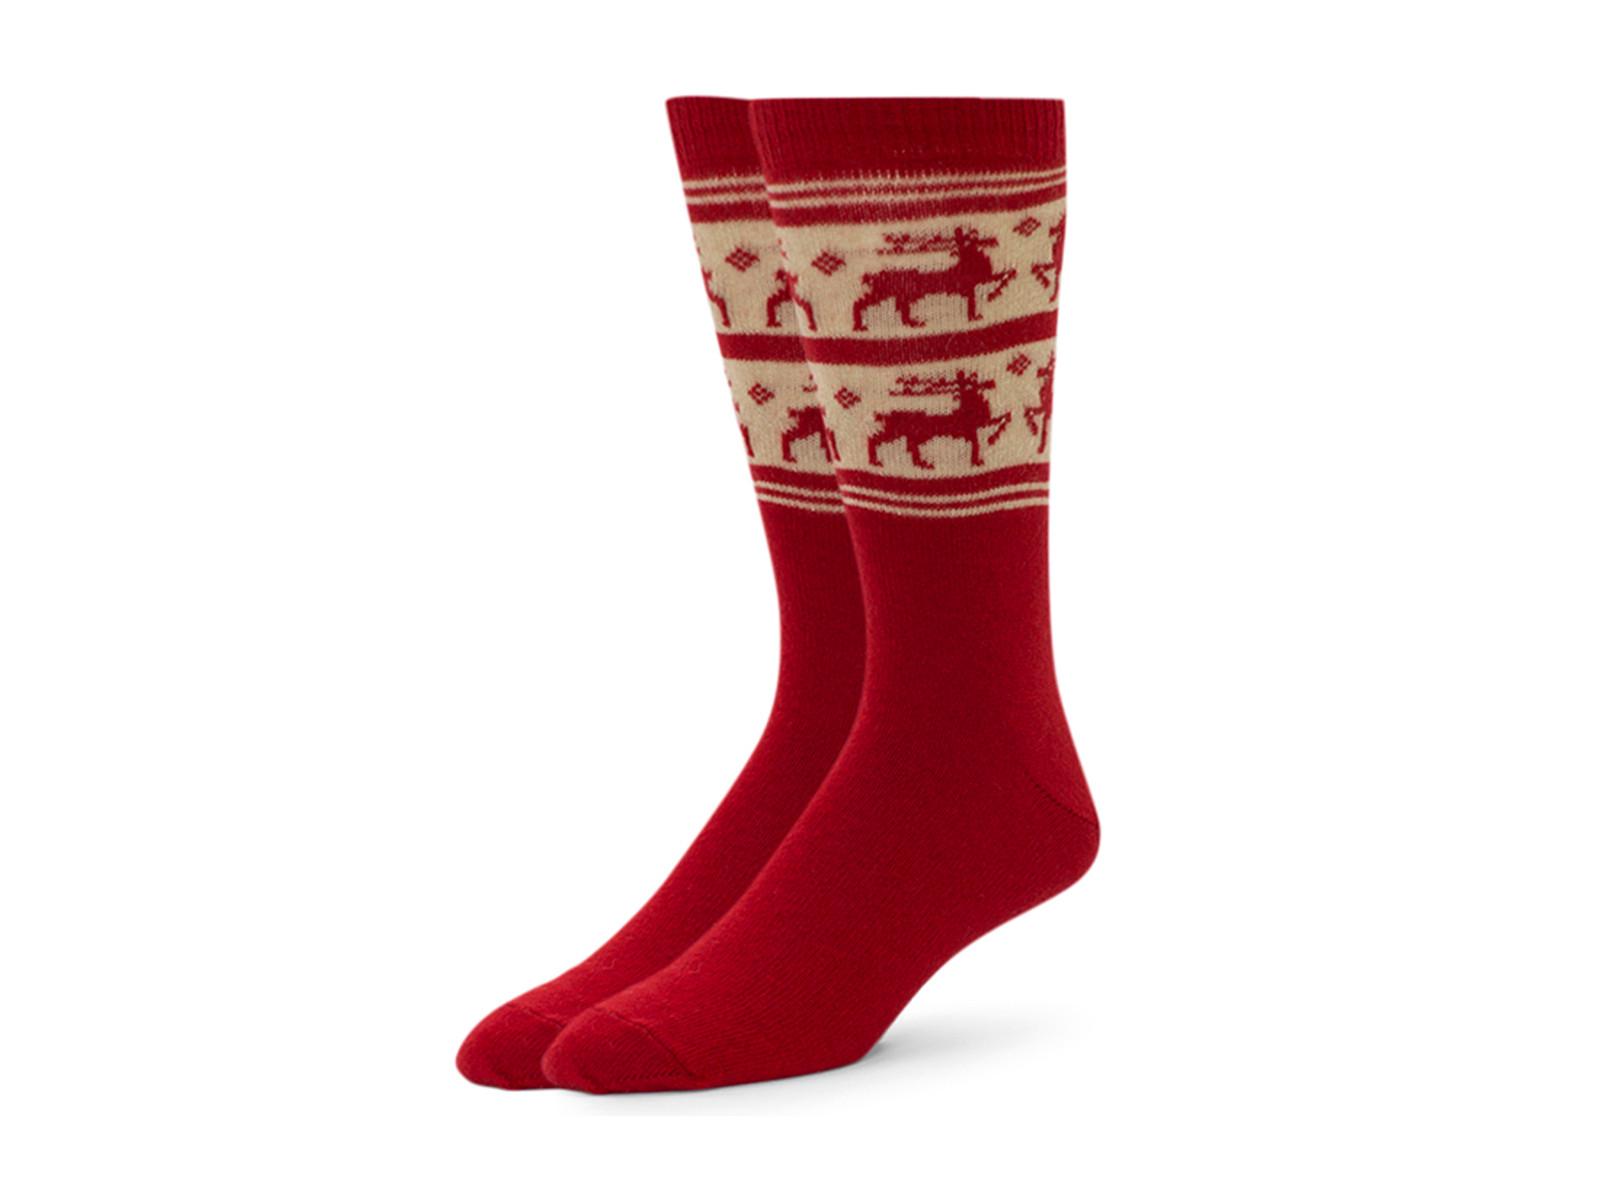 Alchester & Sons Rudolph Reindeer Socks, Men's One Size - Red (AL0678-03000)